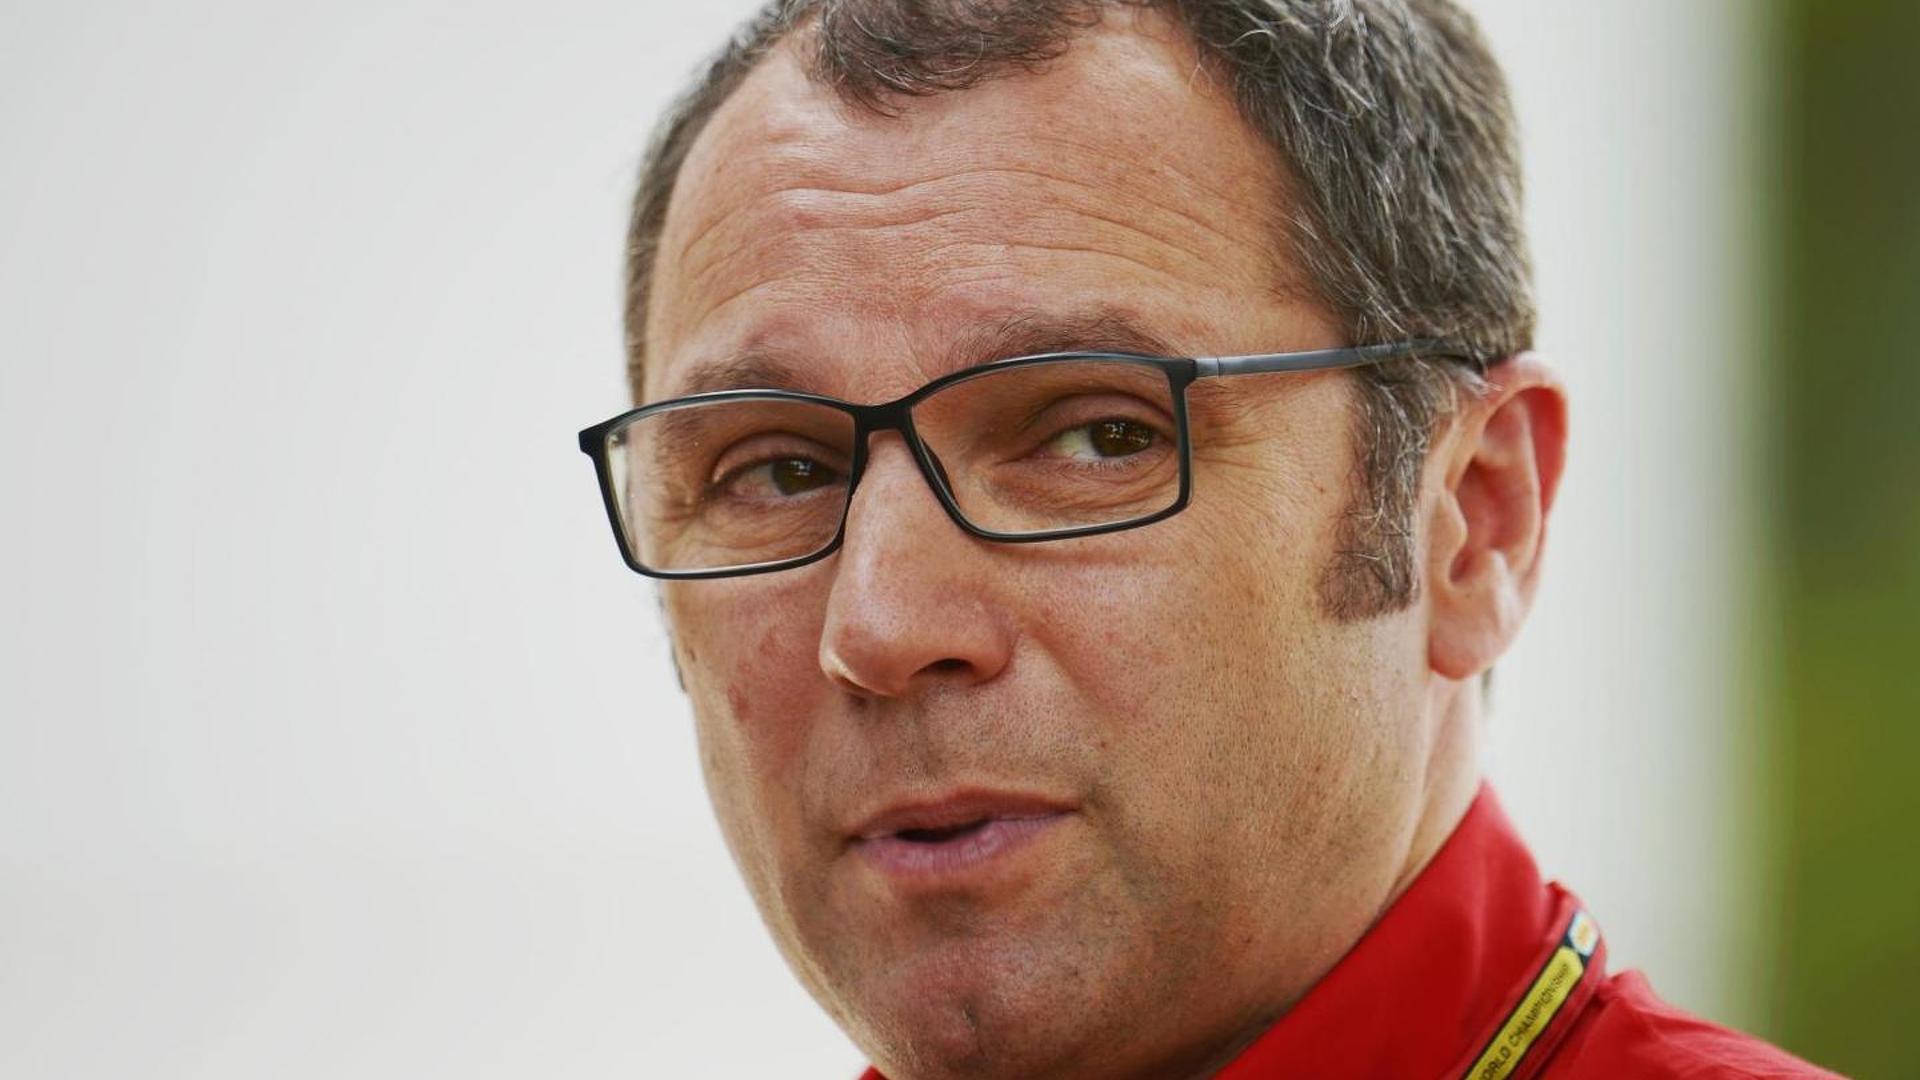 Domenicali to start work at Audi next week - report